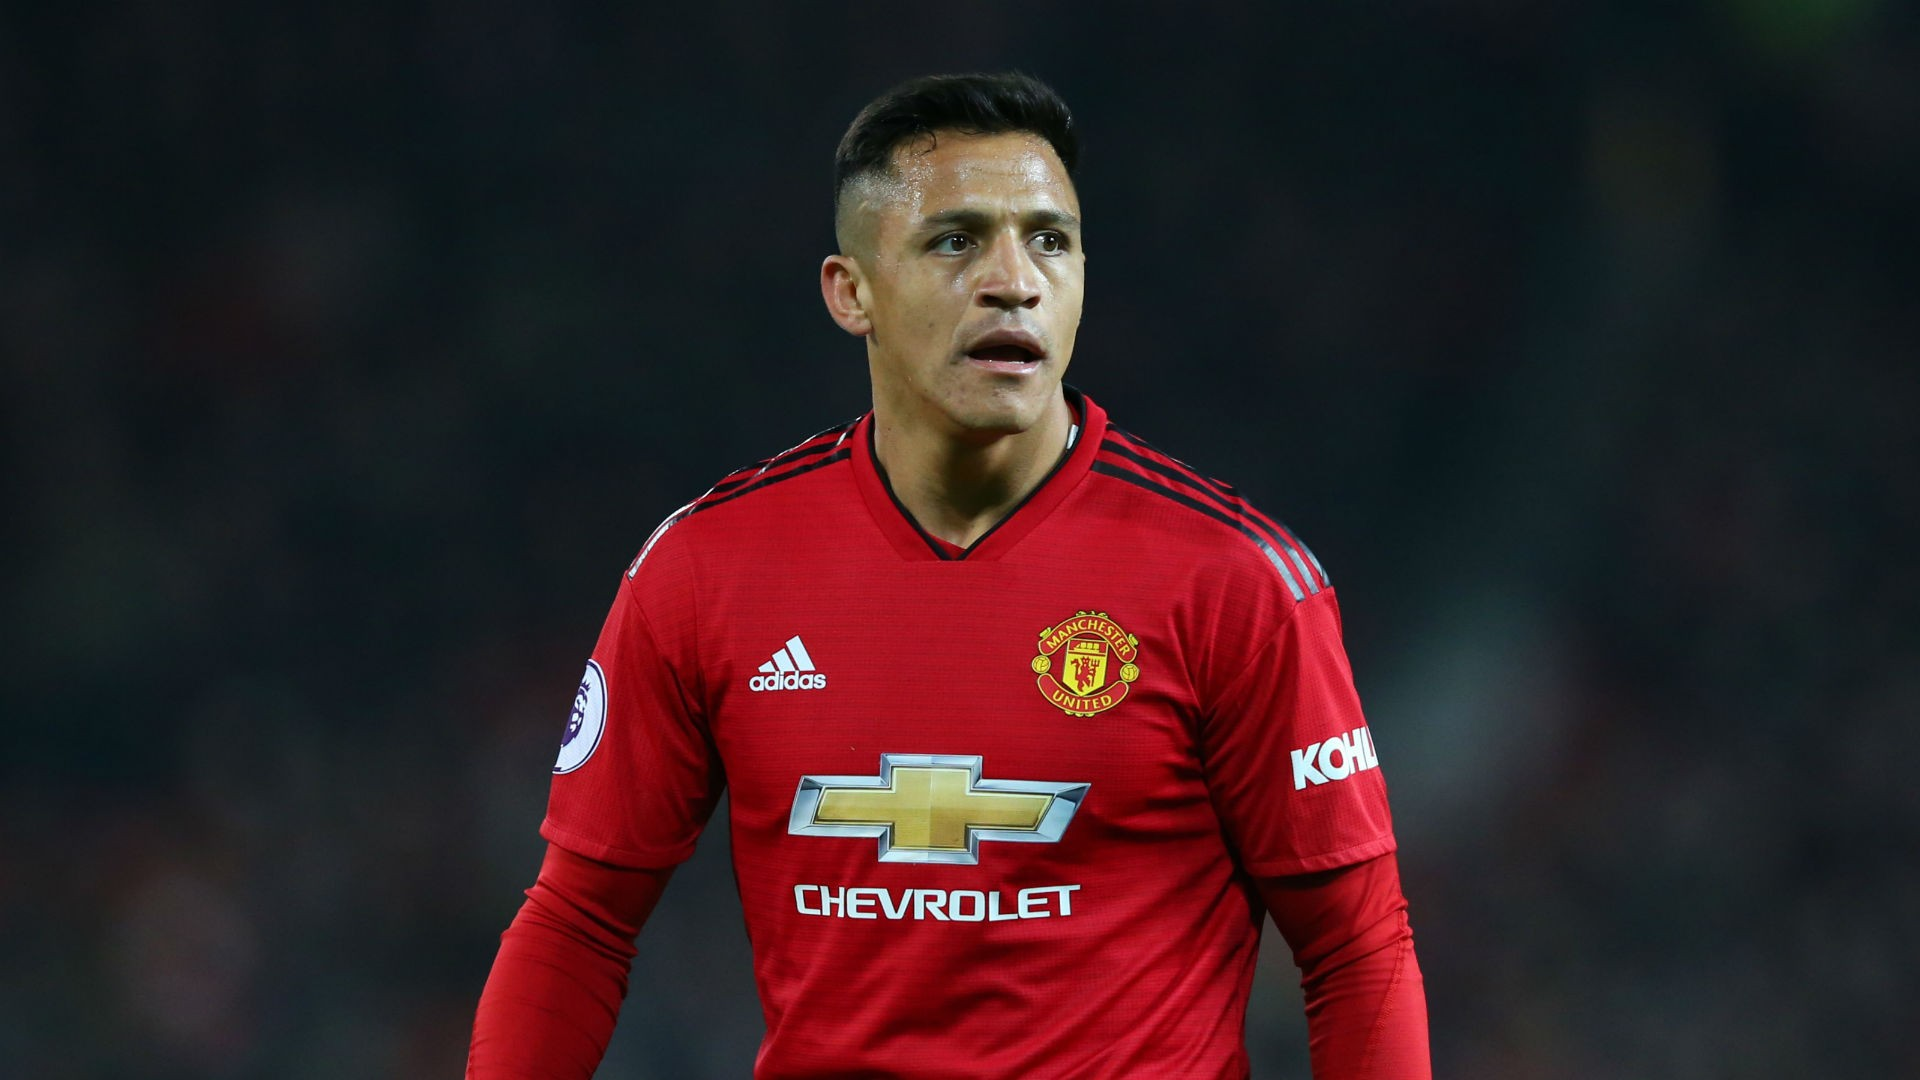 Arsenal's Bukayo Saka could become 8th player to swap Gunners for Man Utd - Bóng Đá